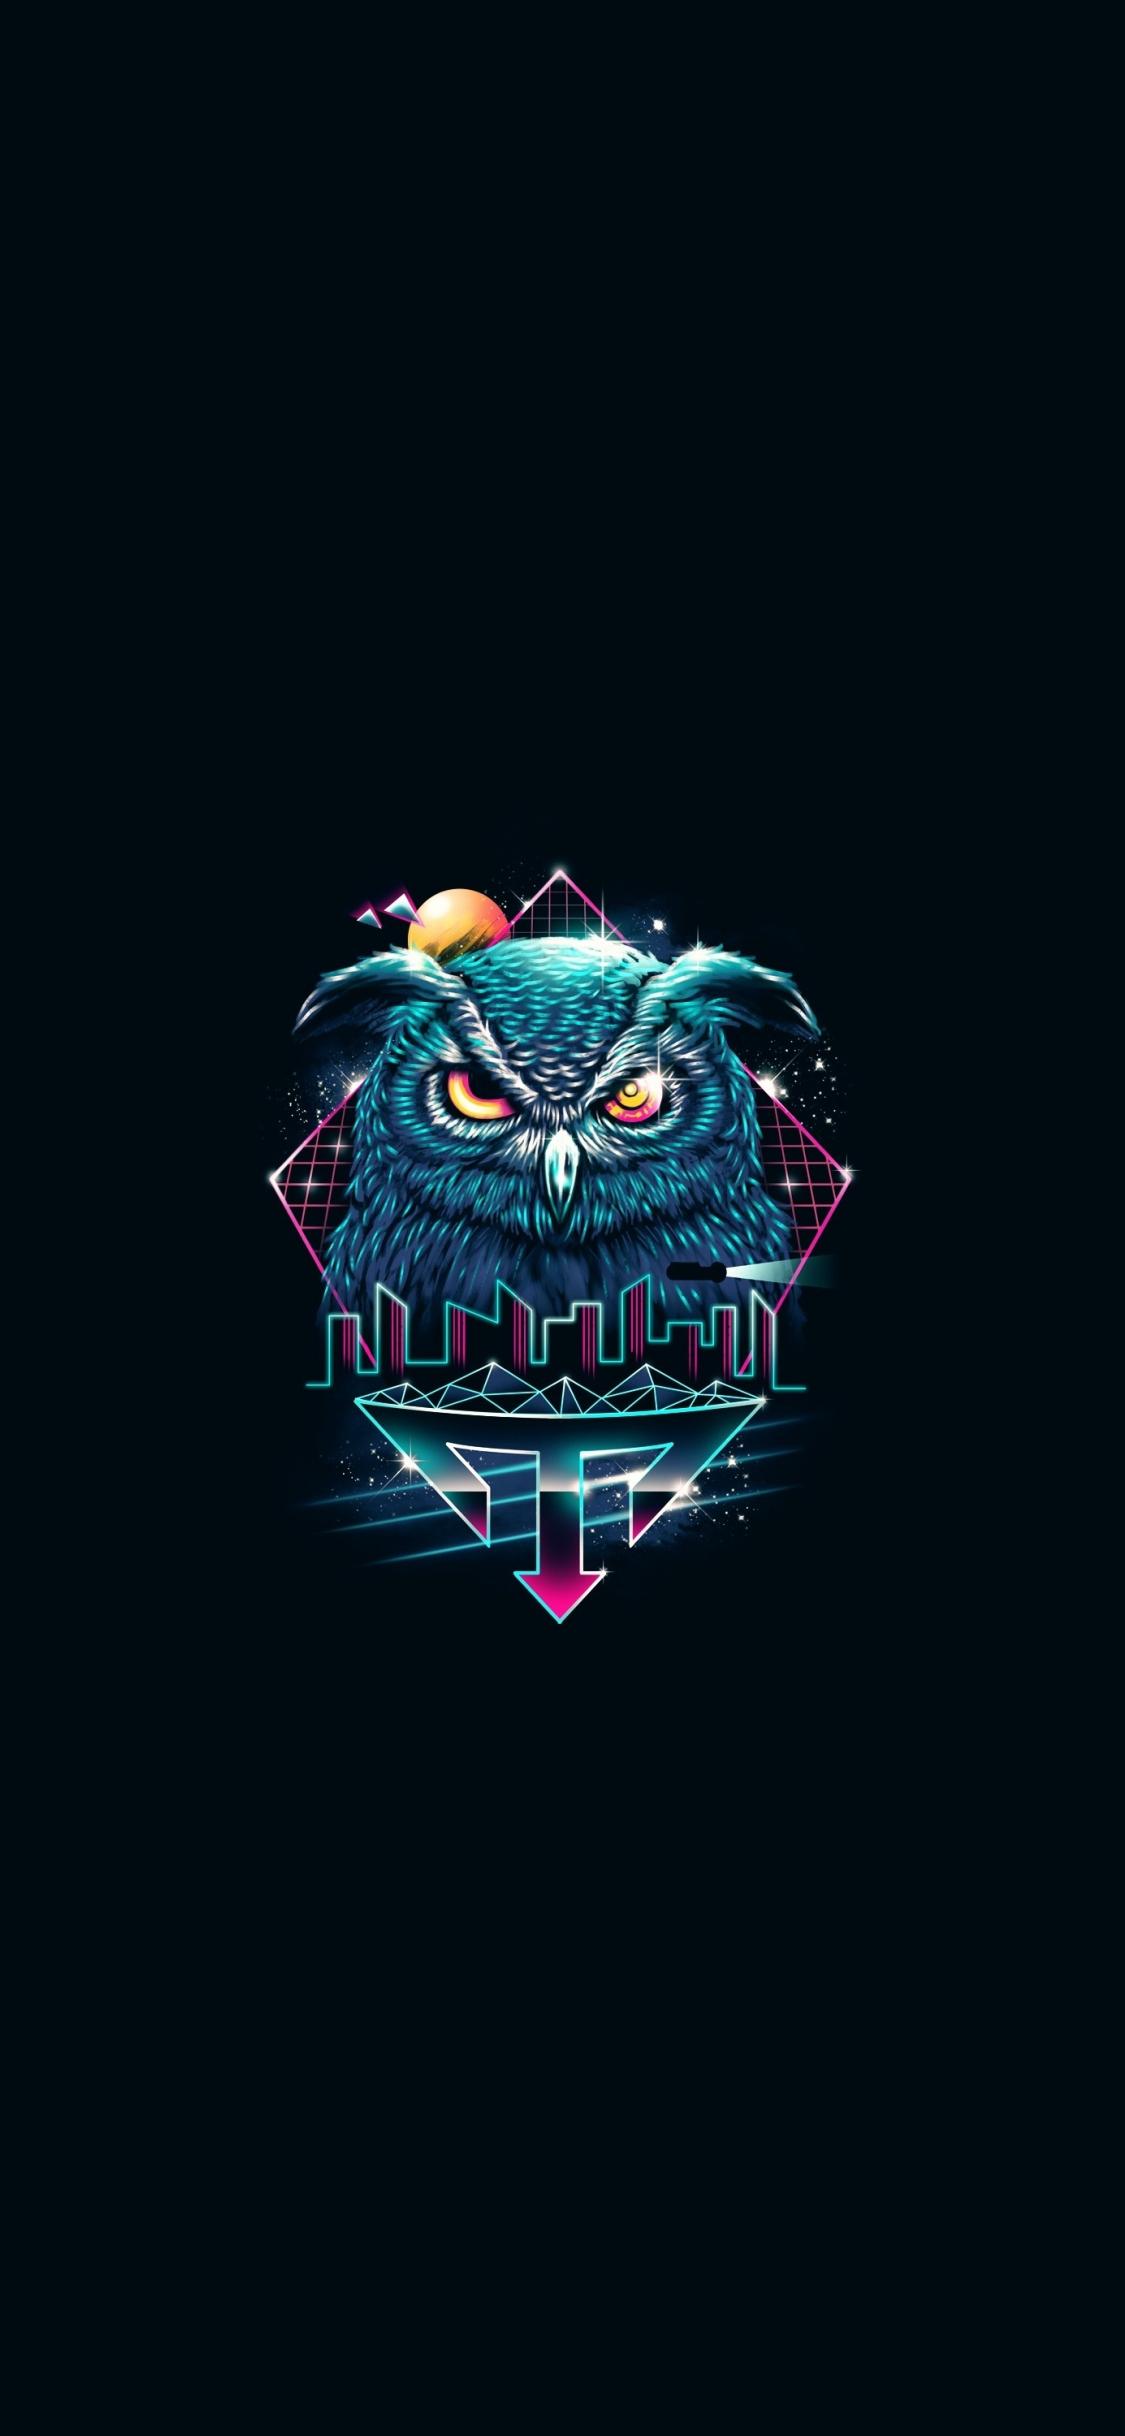 Download 1125x2436 Wallpaper Minimal Attitude Owl Retro Art